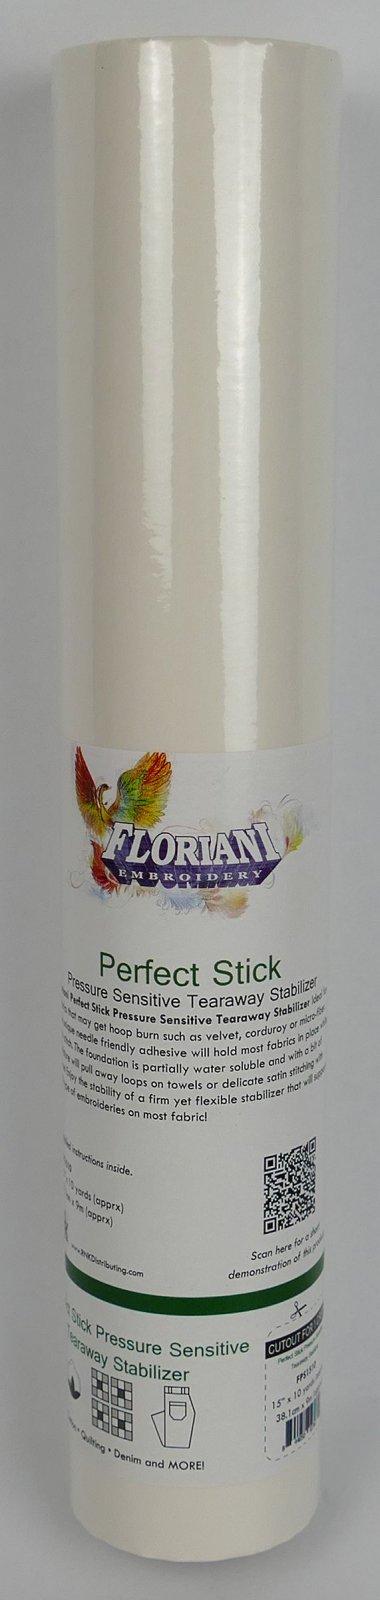 Perfect Stick Tearaway Stabilizer - 15 x 10 yards - Floriani